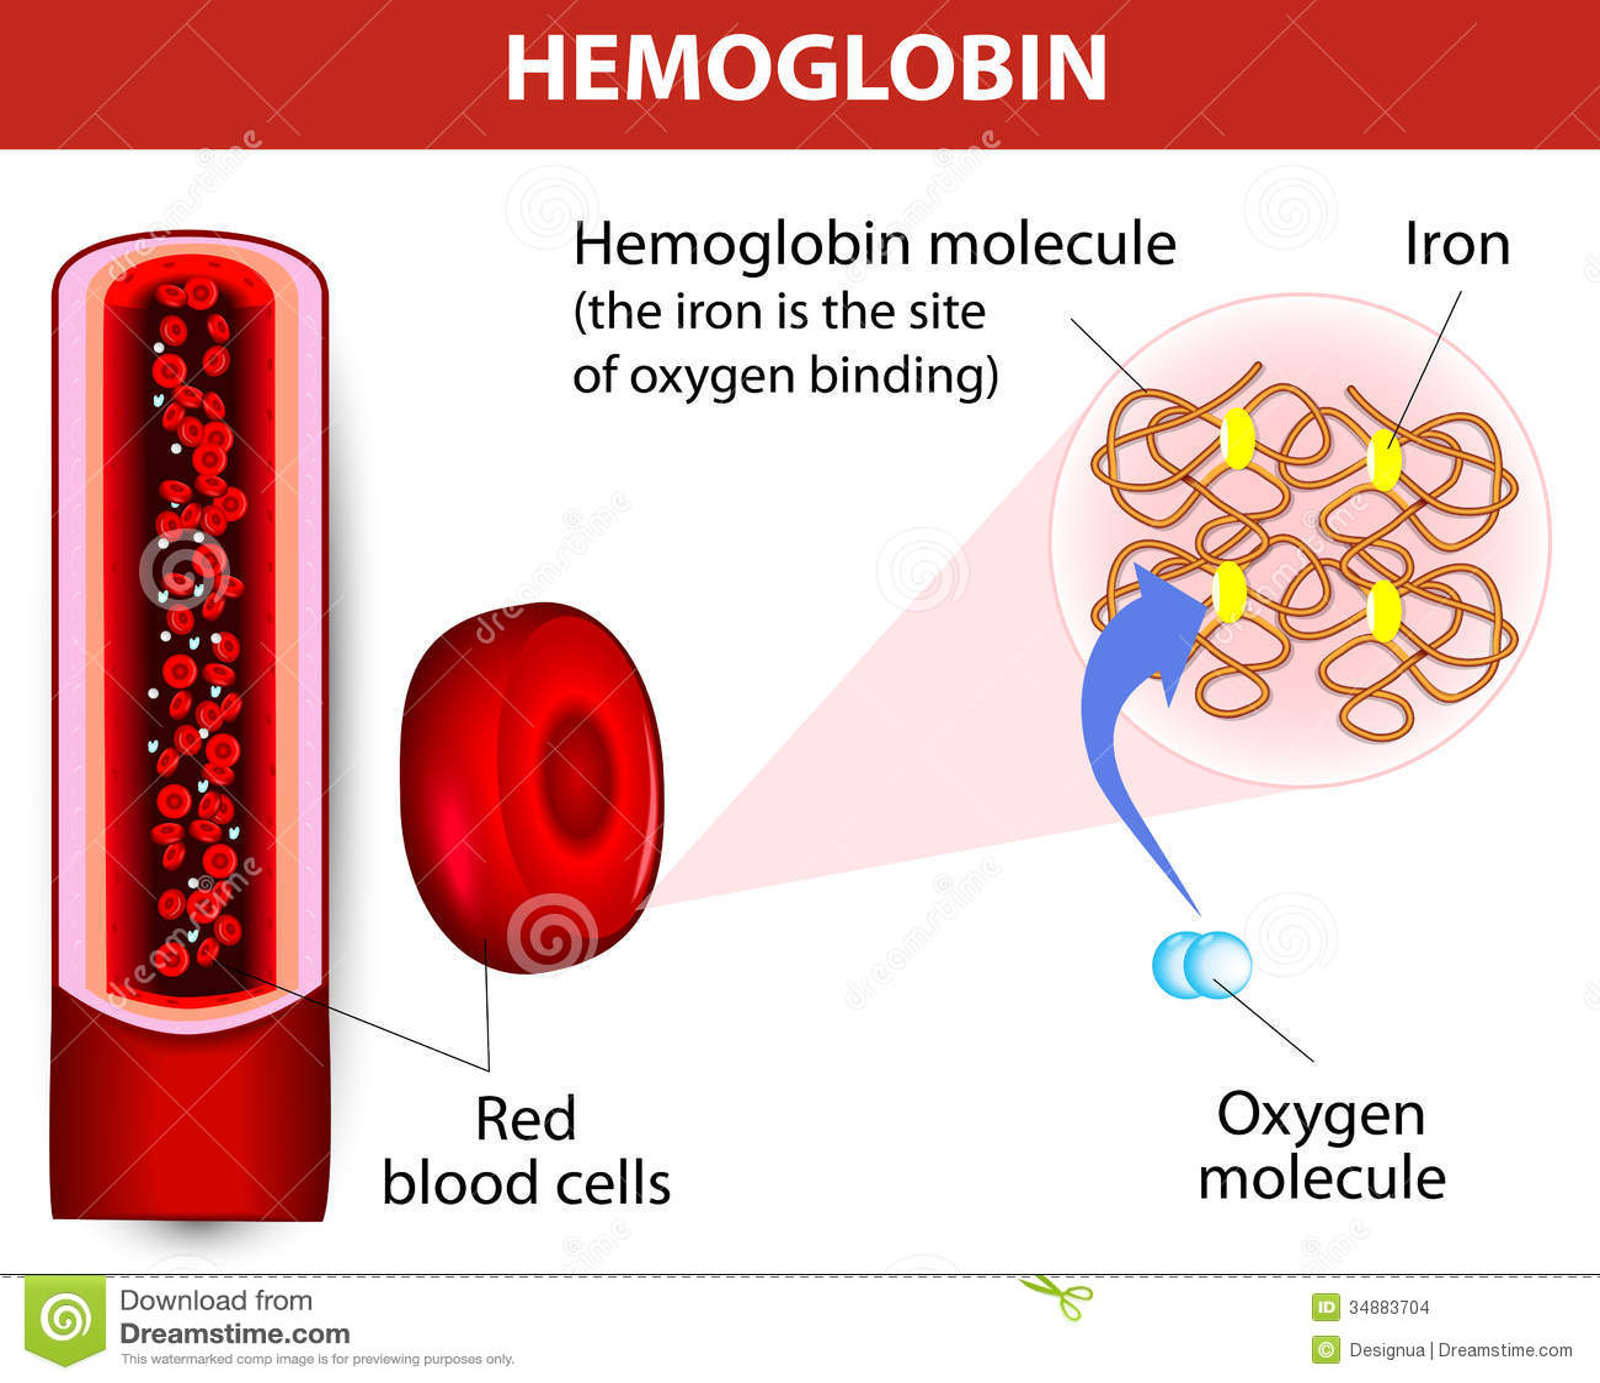 Molecule Haemoglobin Stock Images